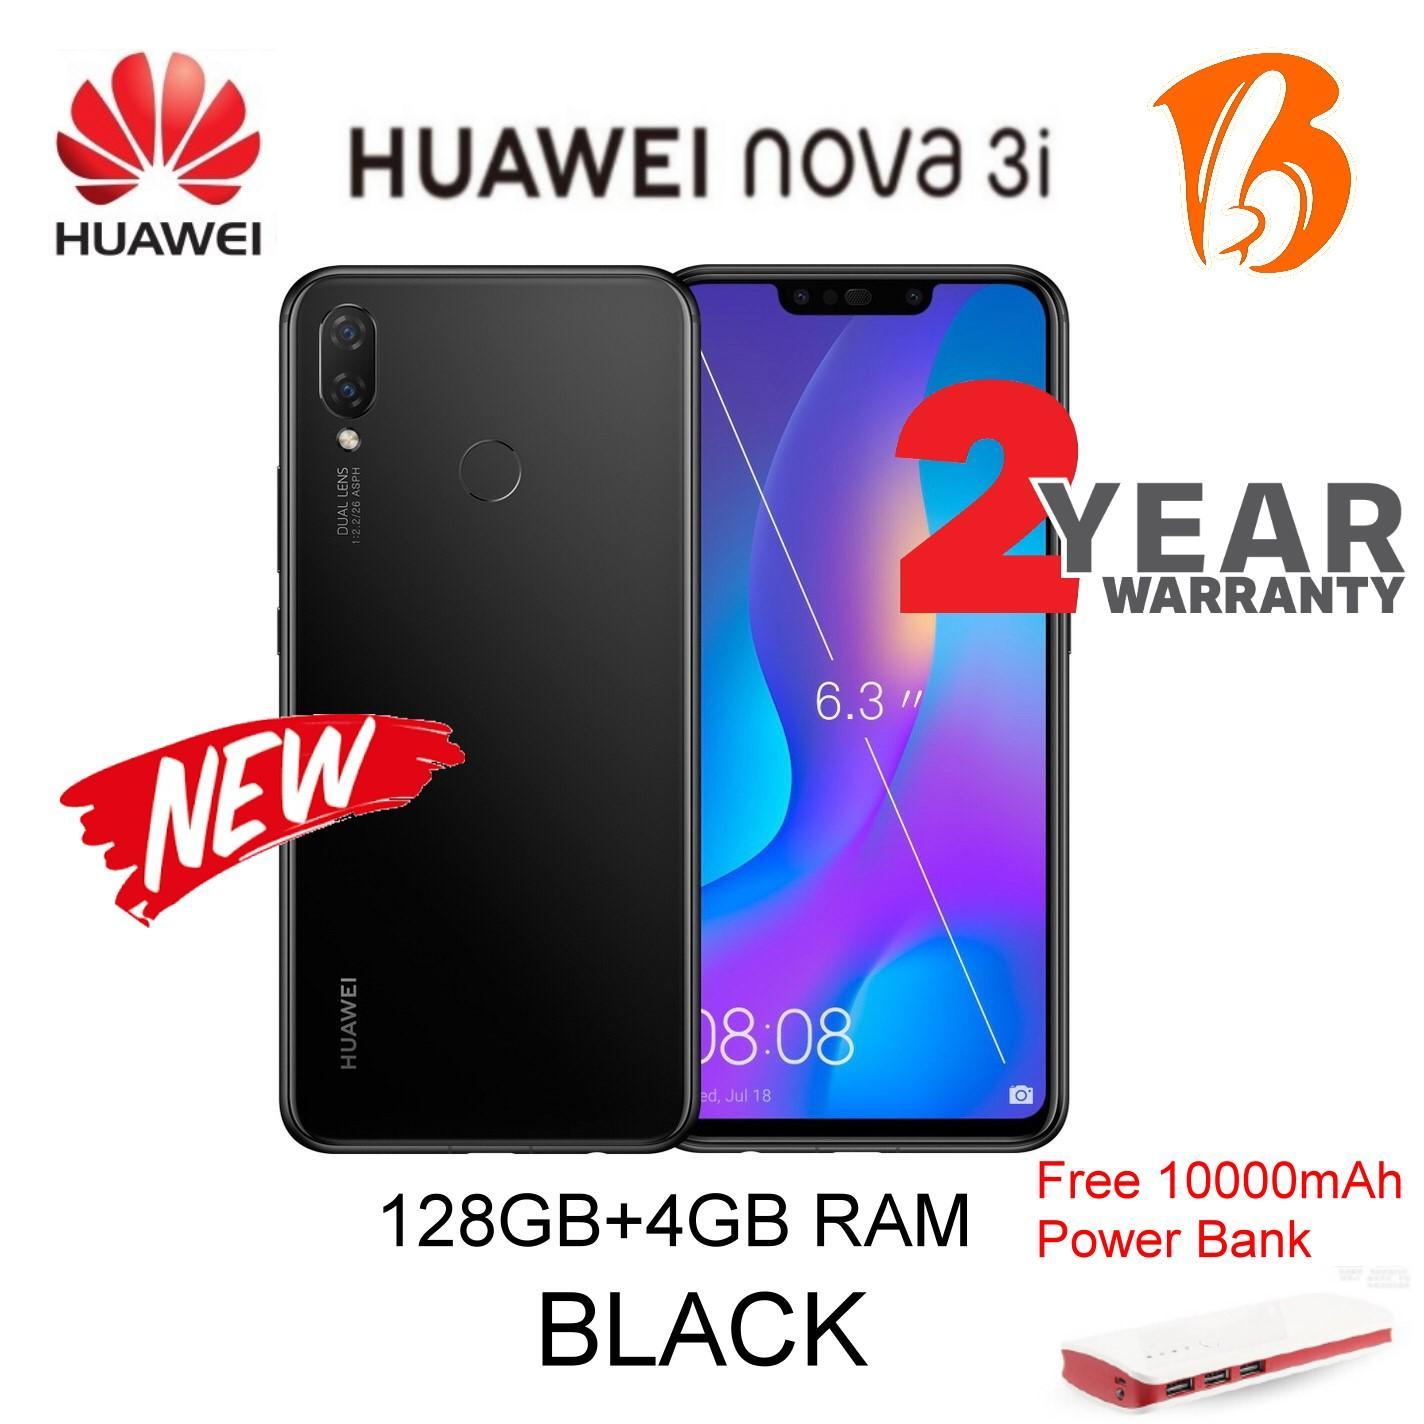 Huawei Nova 3i 4GB/128GB with 2 Year Local Warranty